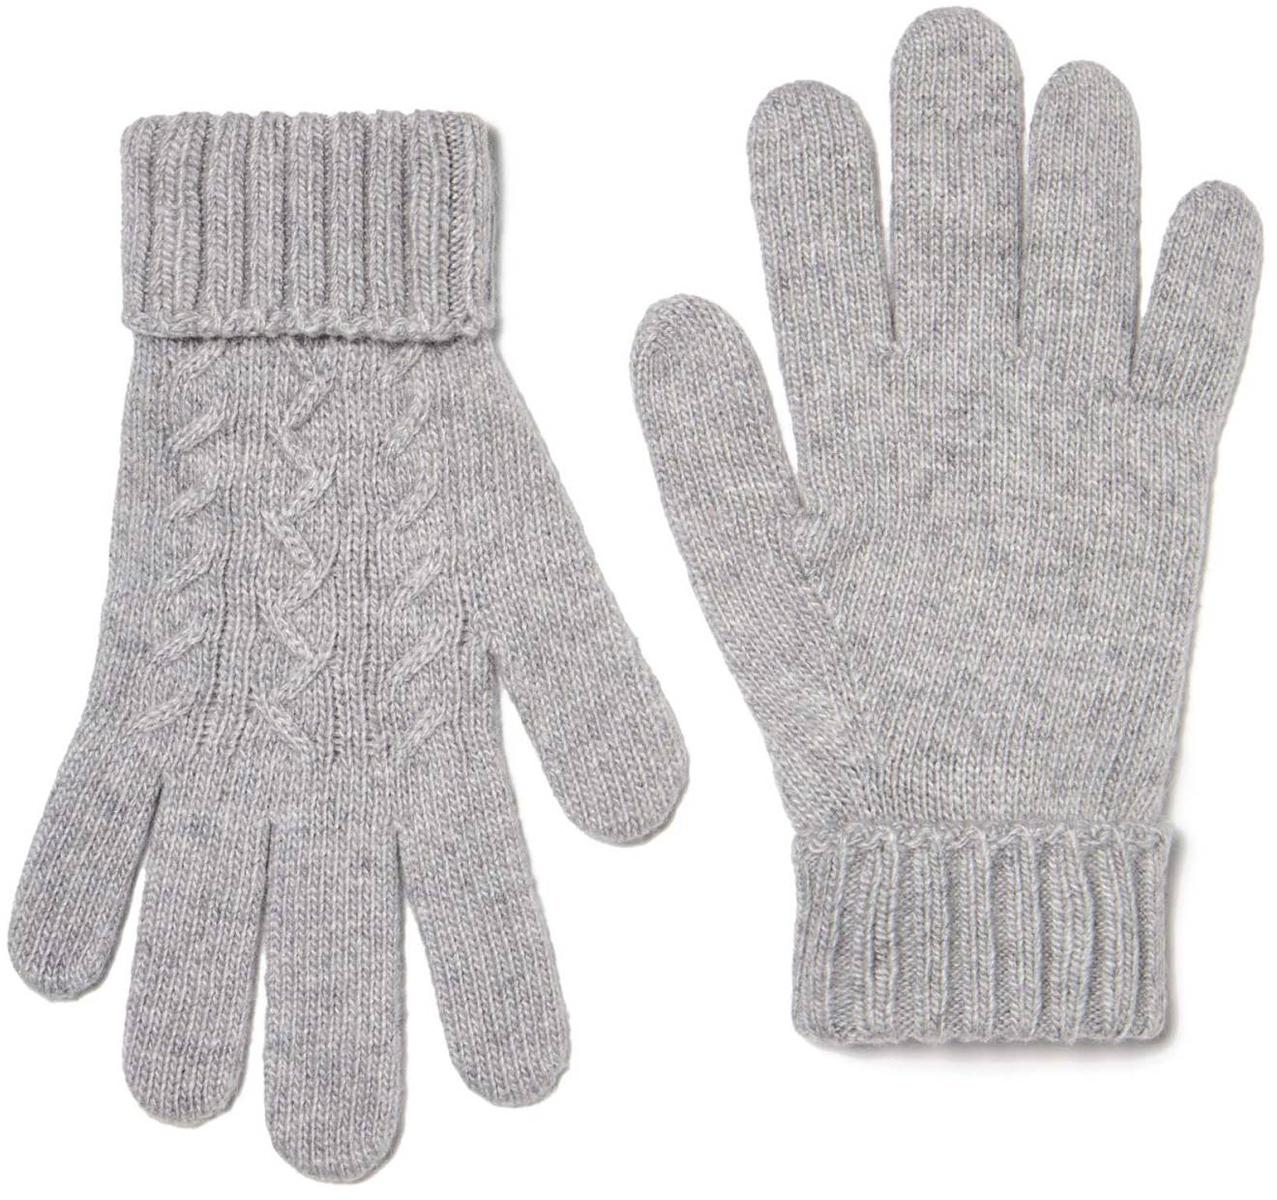 Перчатки для девочки United Colors of Benetton, цвет: серый. 1232C0186_501. Размер 5